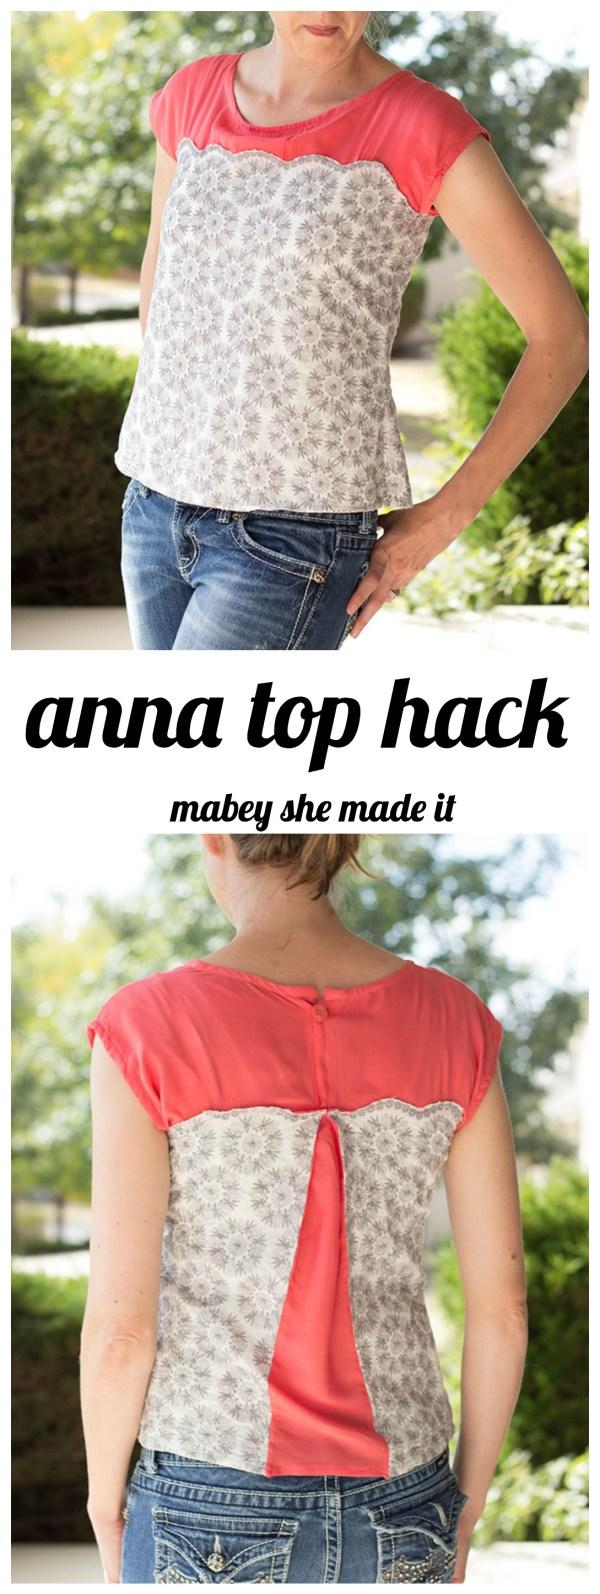 Anna Top Hack--Add a fun detail to the Anna Top using this tutorial.